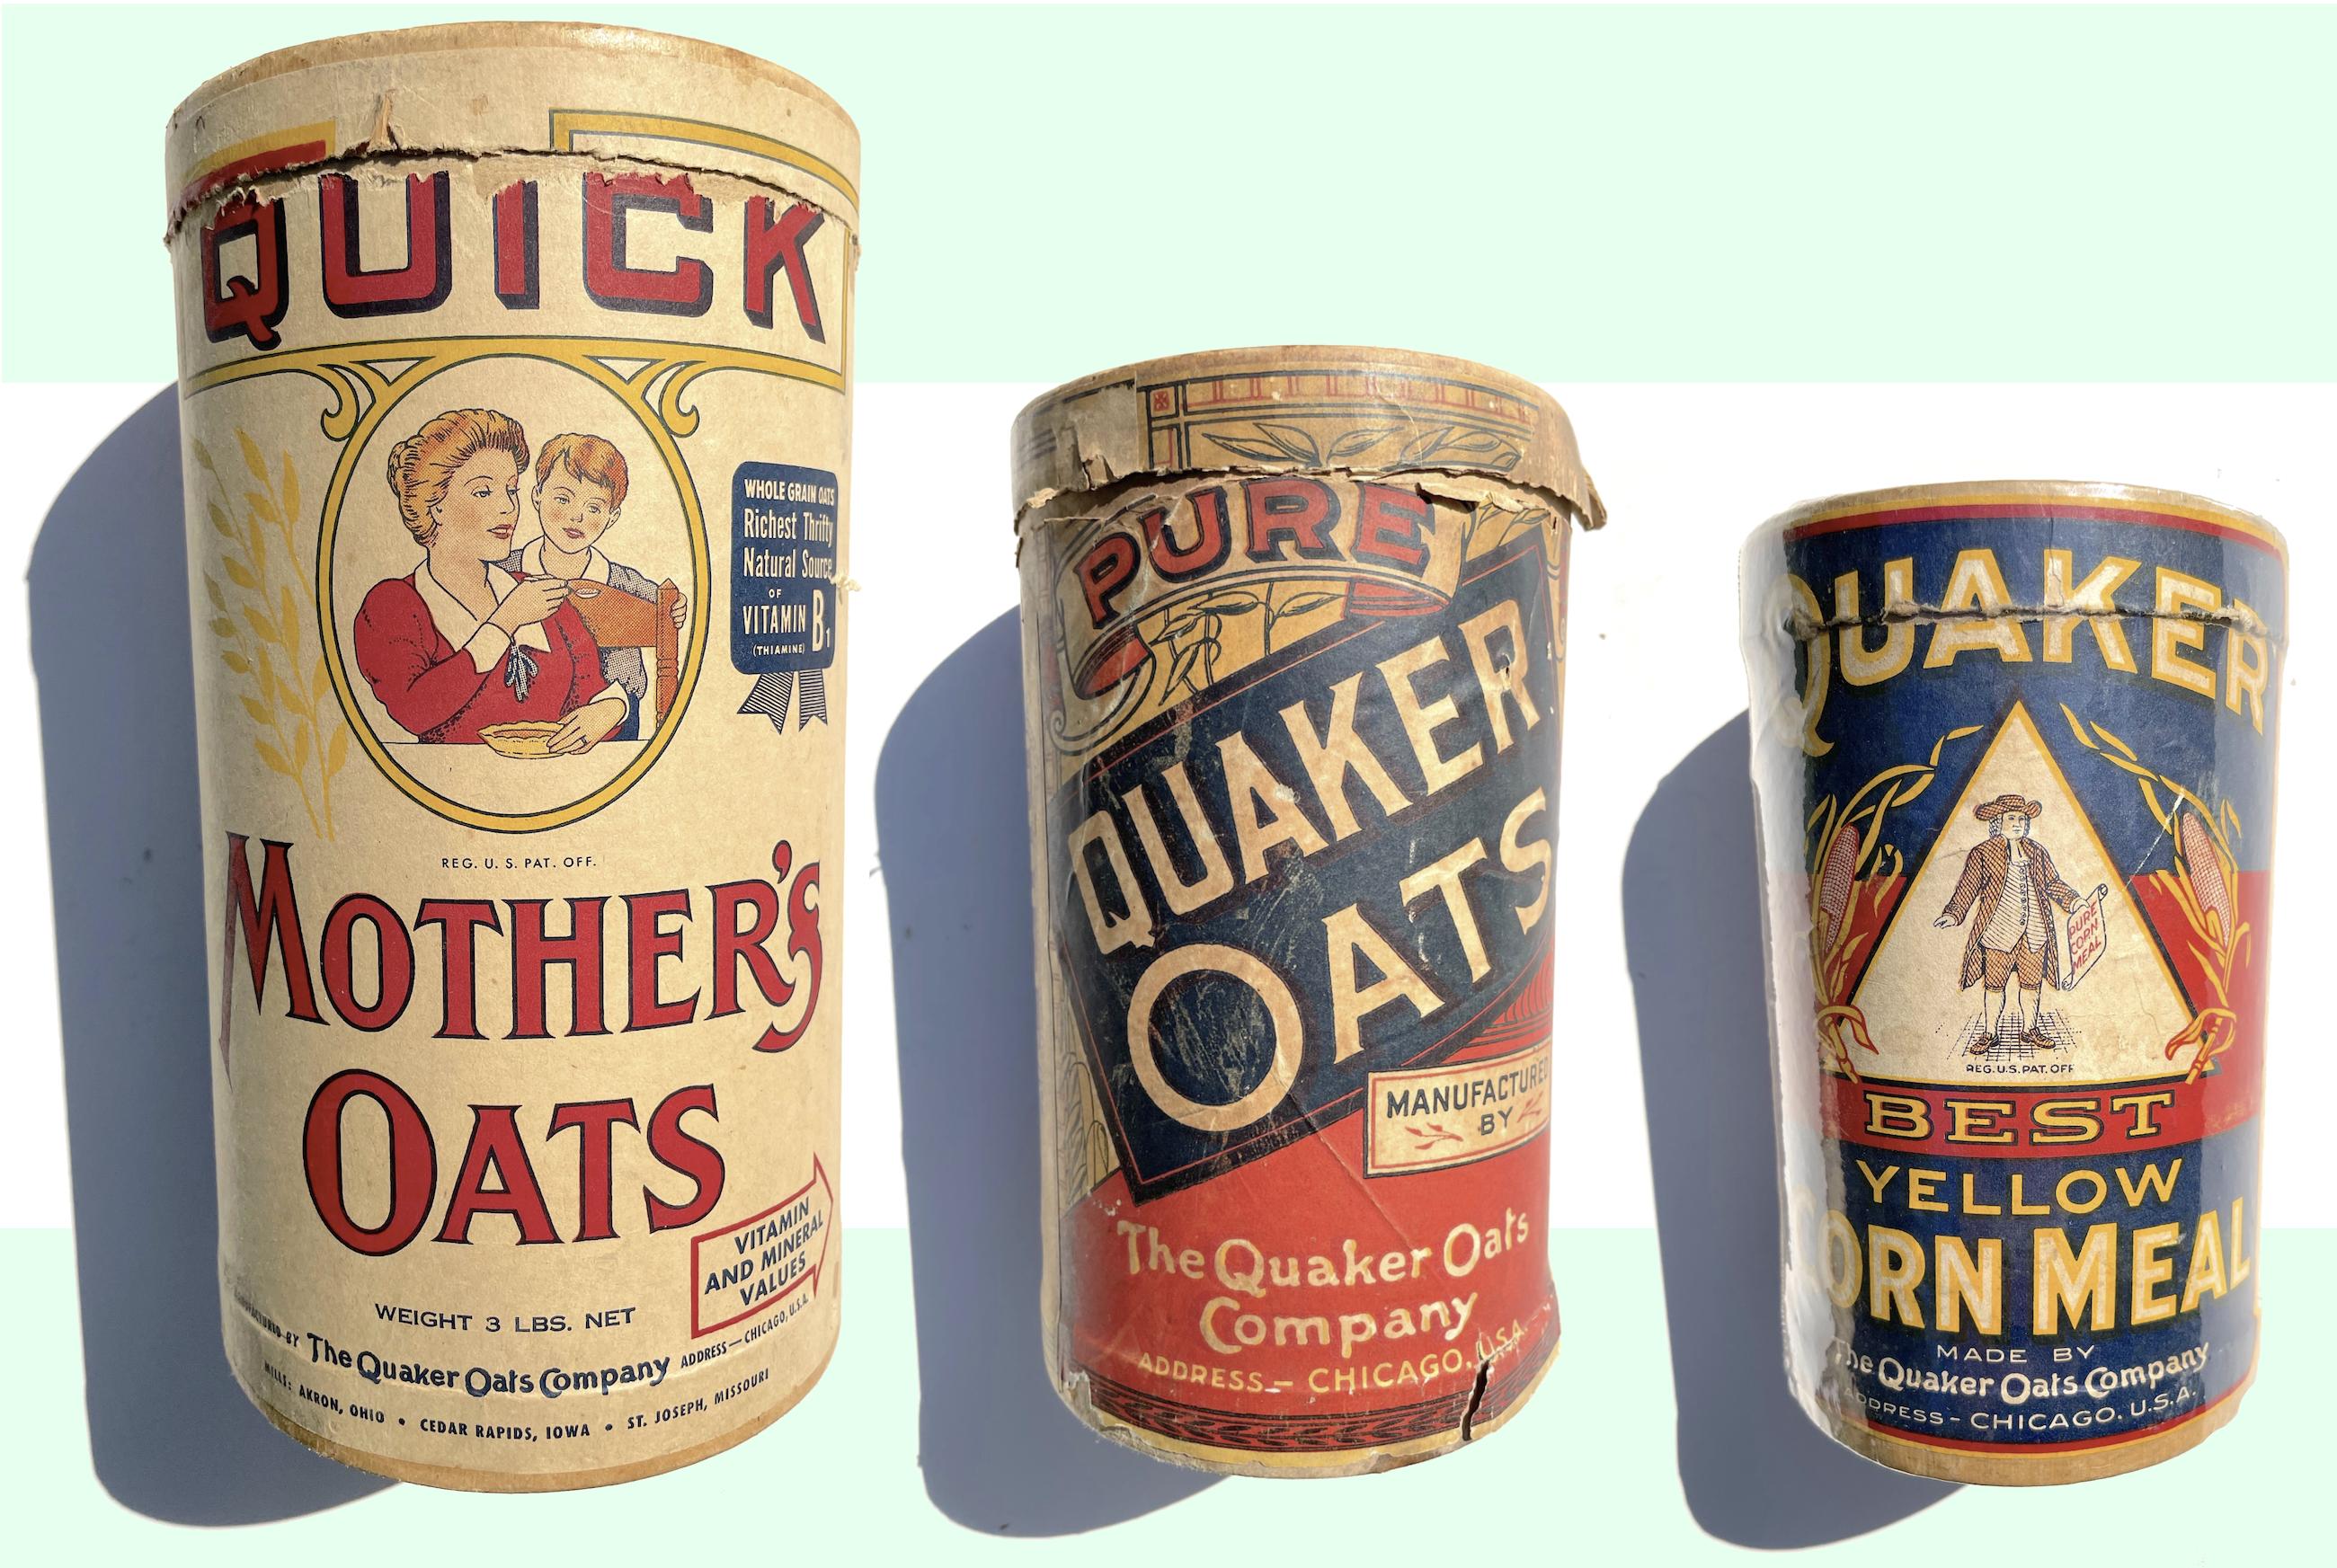 Quaker Oats history